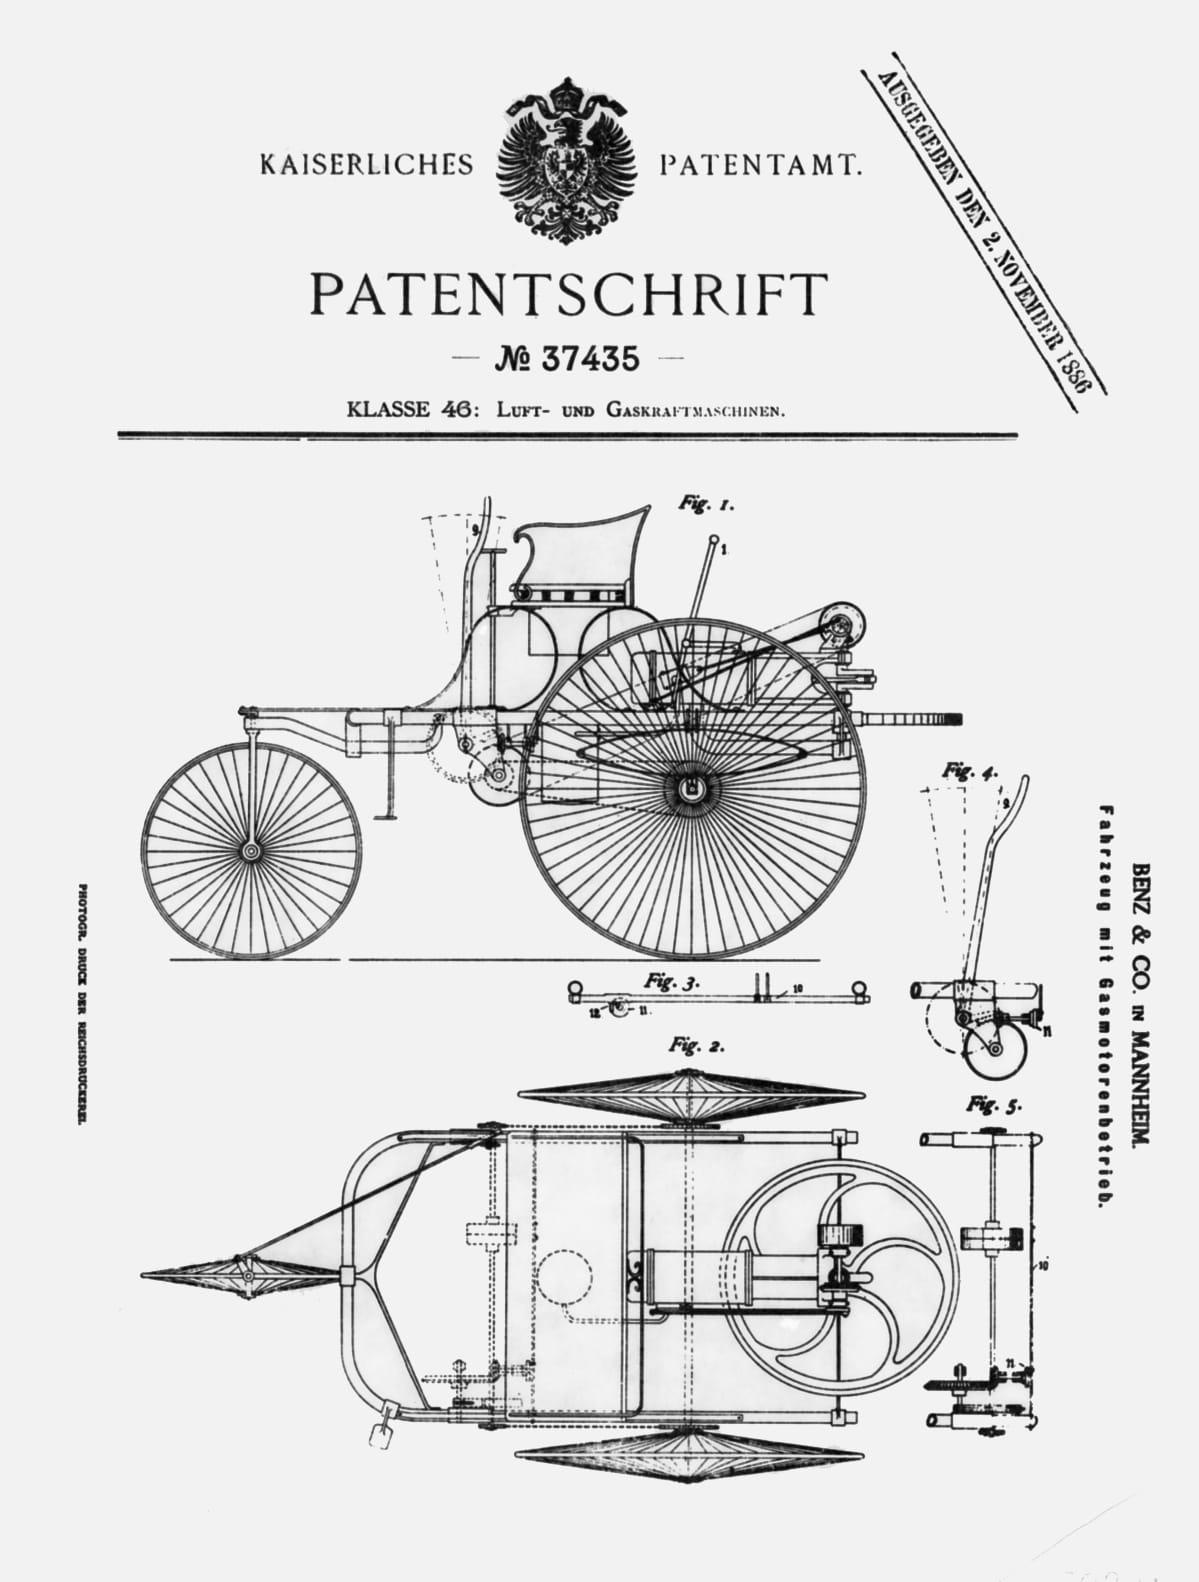 Benz patentttikirja 1886